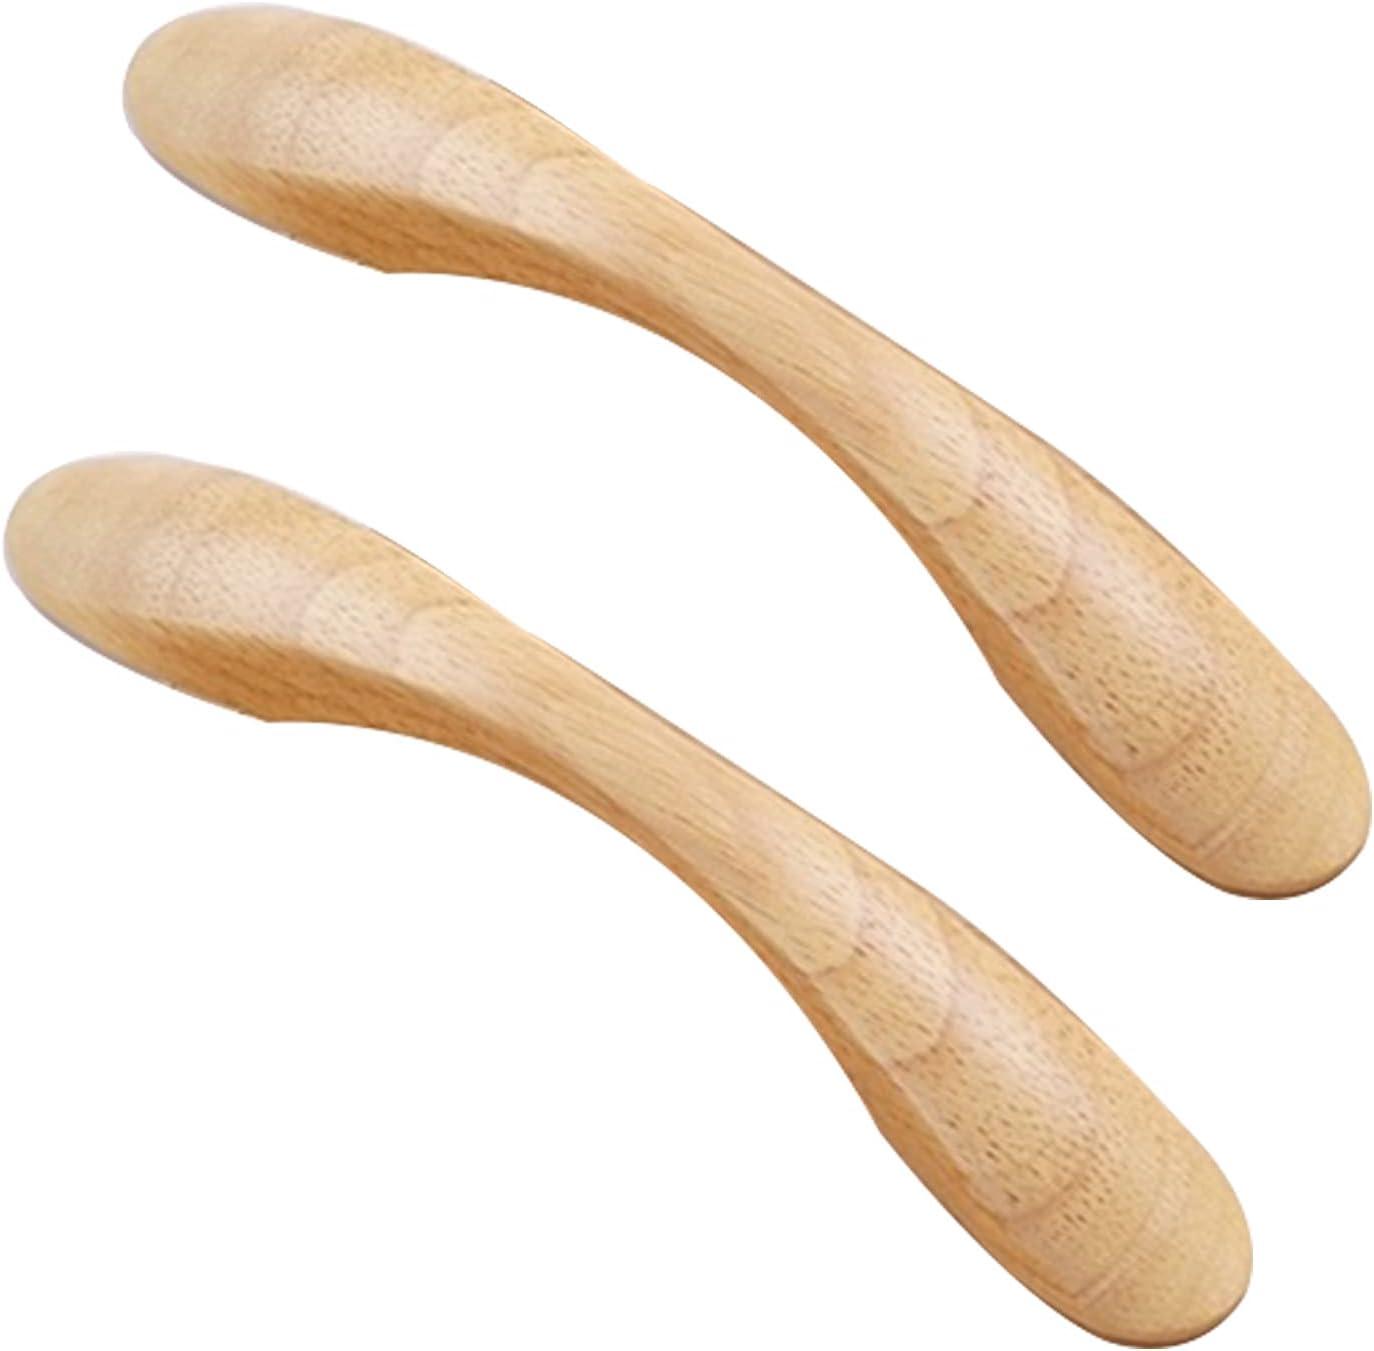 2 Piezas Tiradores de arco de Madera maciza Manijas Madera de caucho Perilla Arco en Forma de Mango Pomos para armario para cajón Asas de gabinete picaportes para Zapatero (Hole distance 128mm)